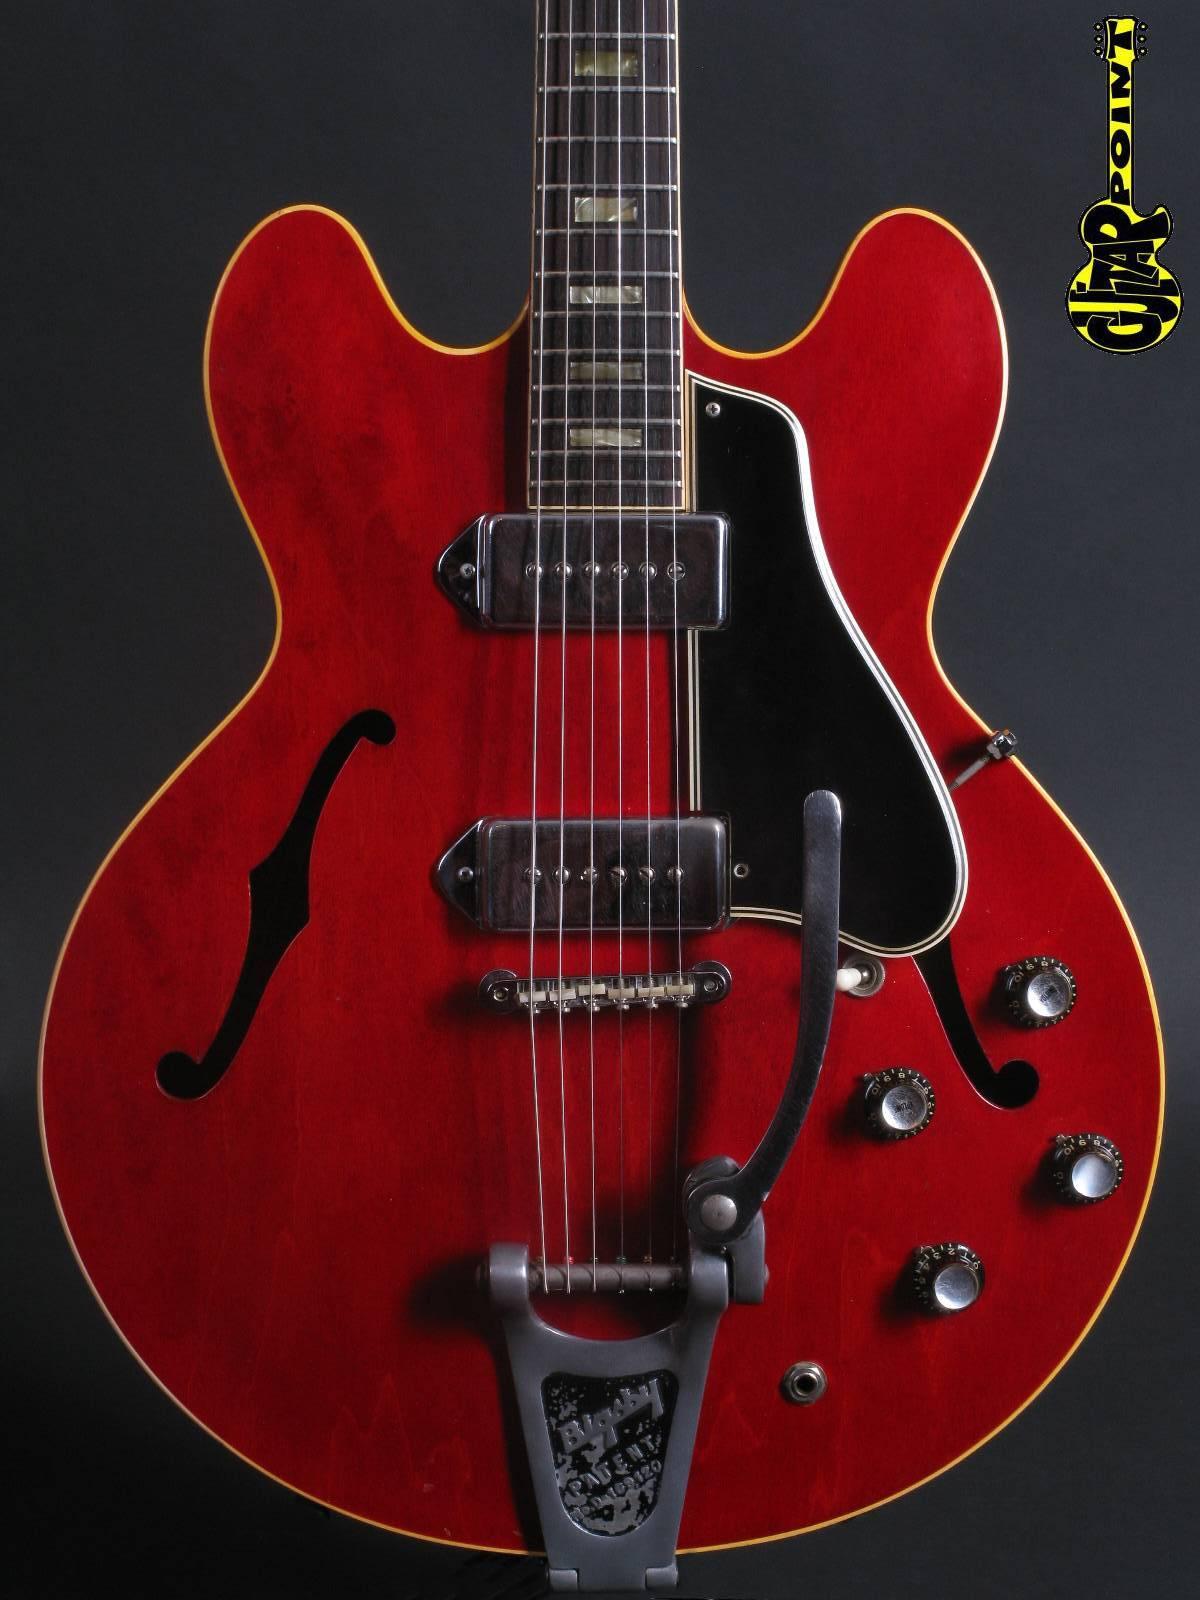 1965 Gibson ES-330 TD/Bigsby - Cherry